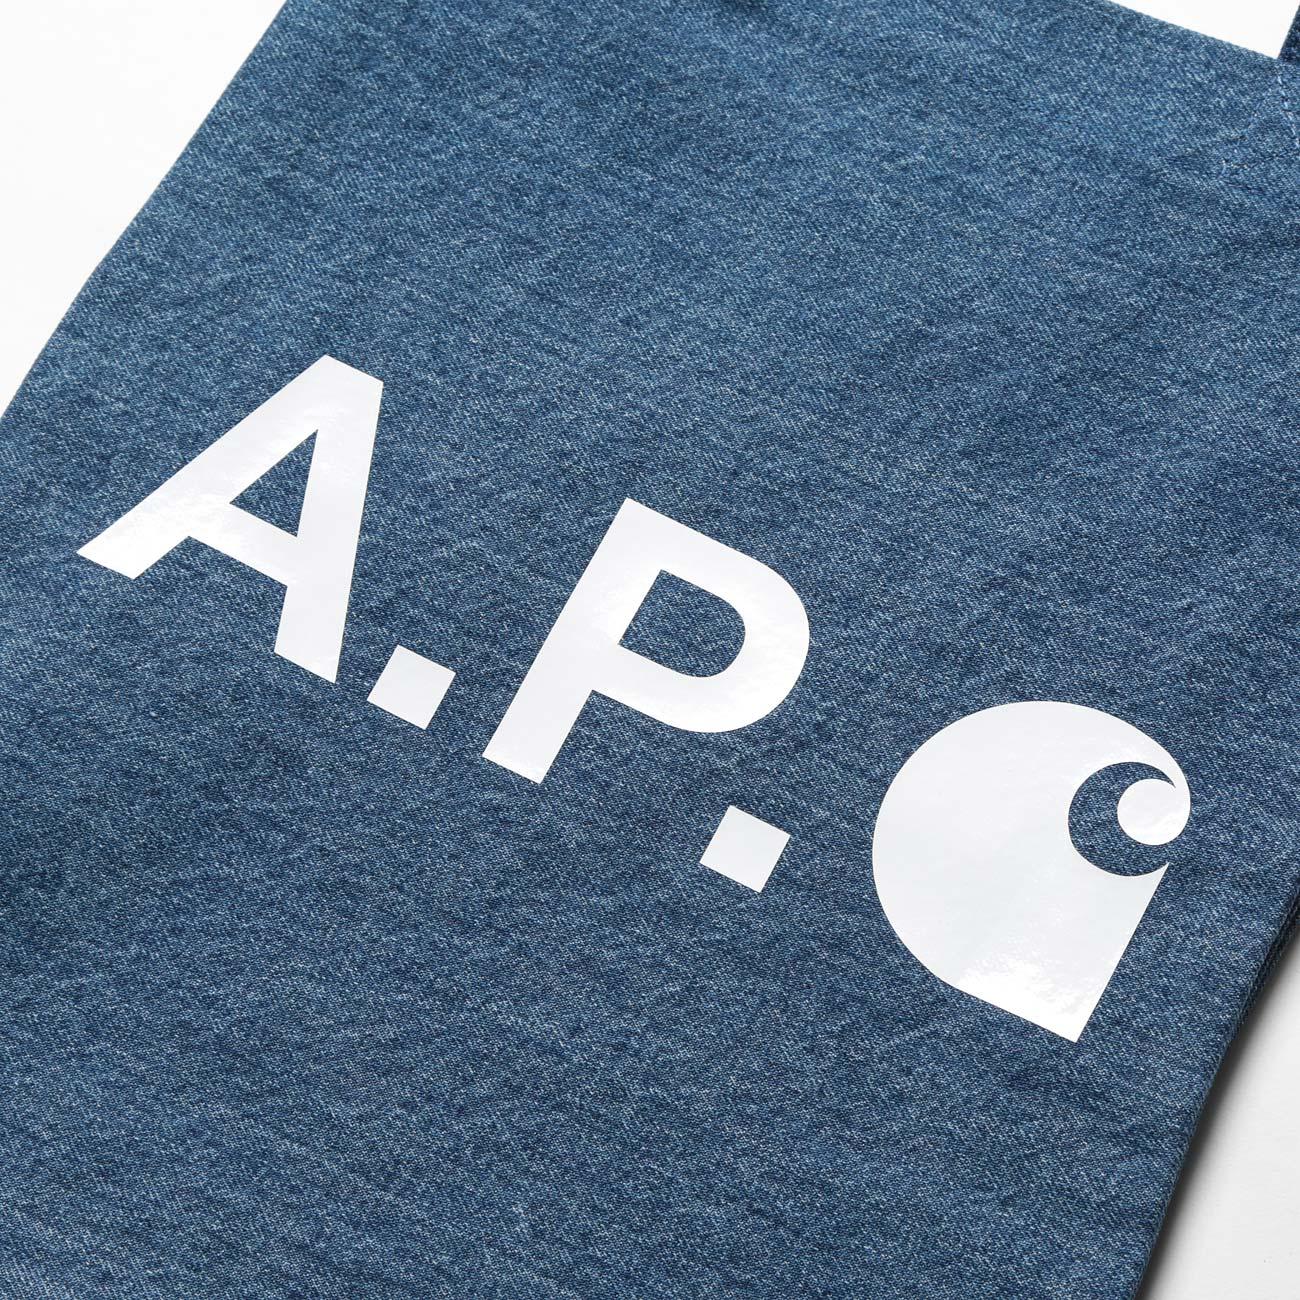 A.P.C. / アーペーセー Carhartt トートバッグ - Washed Indigo